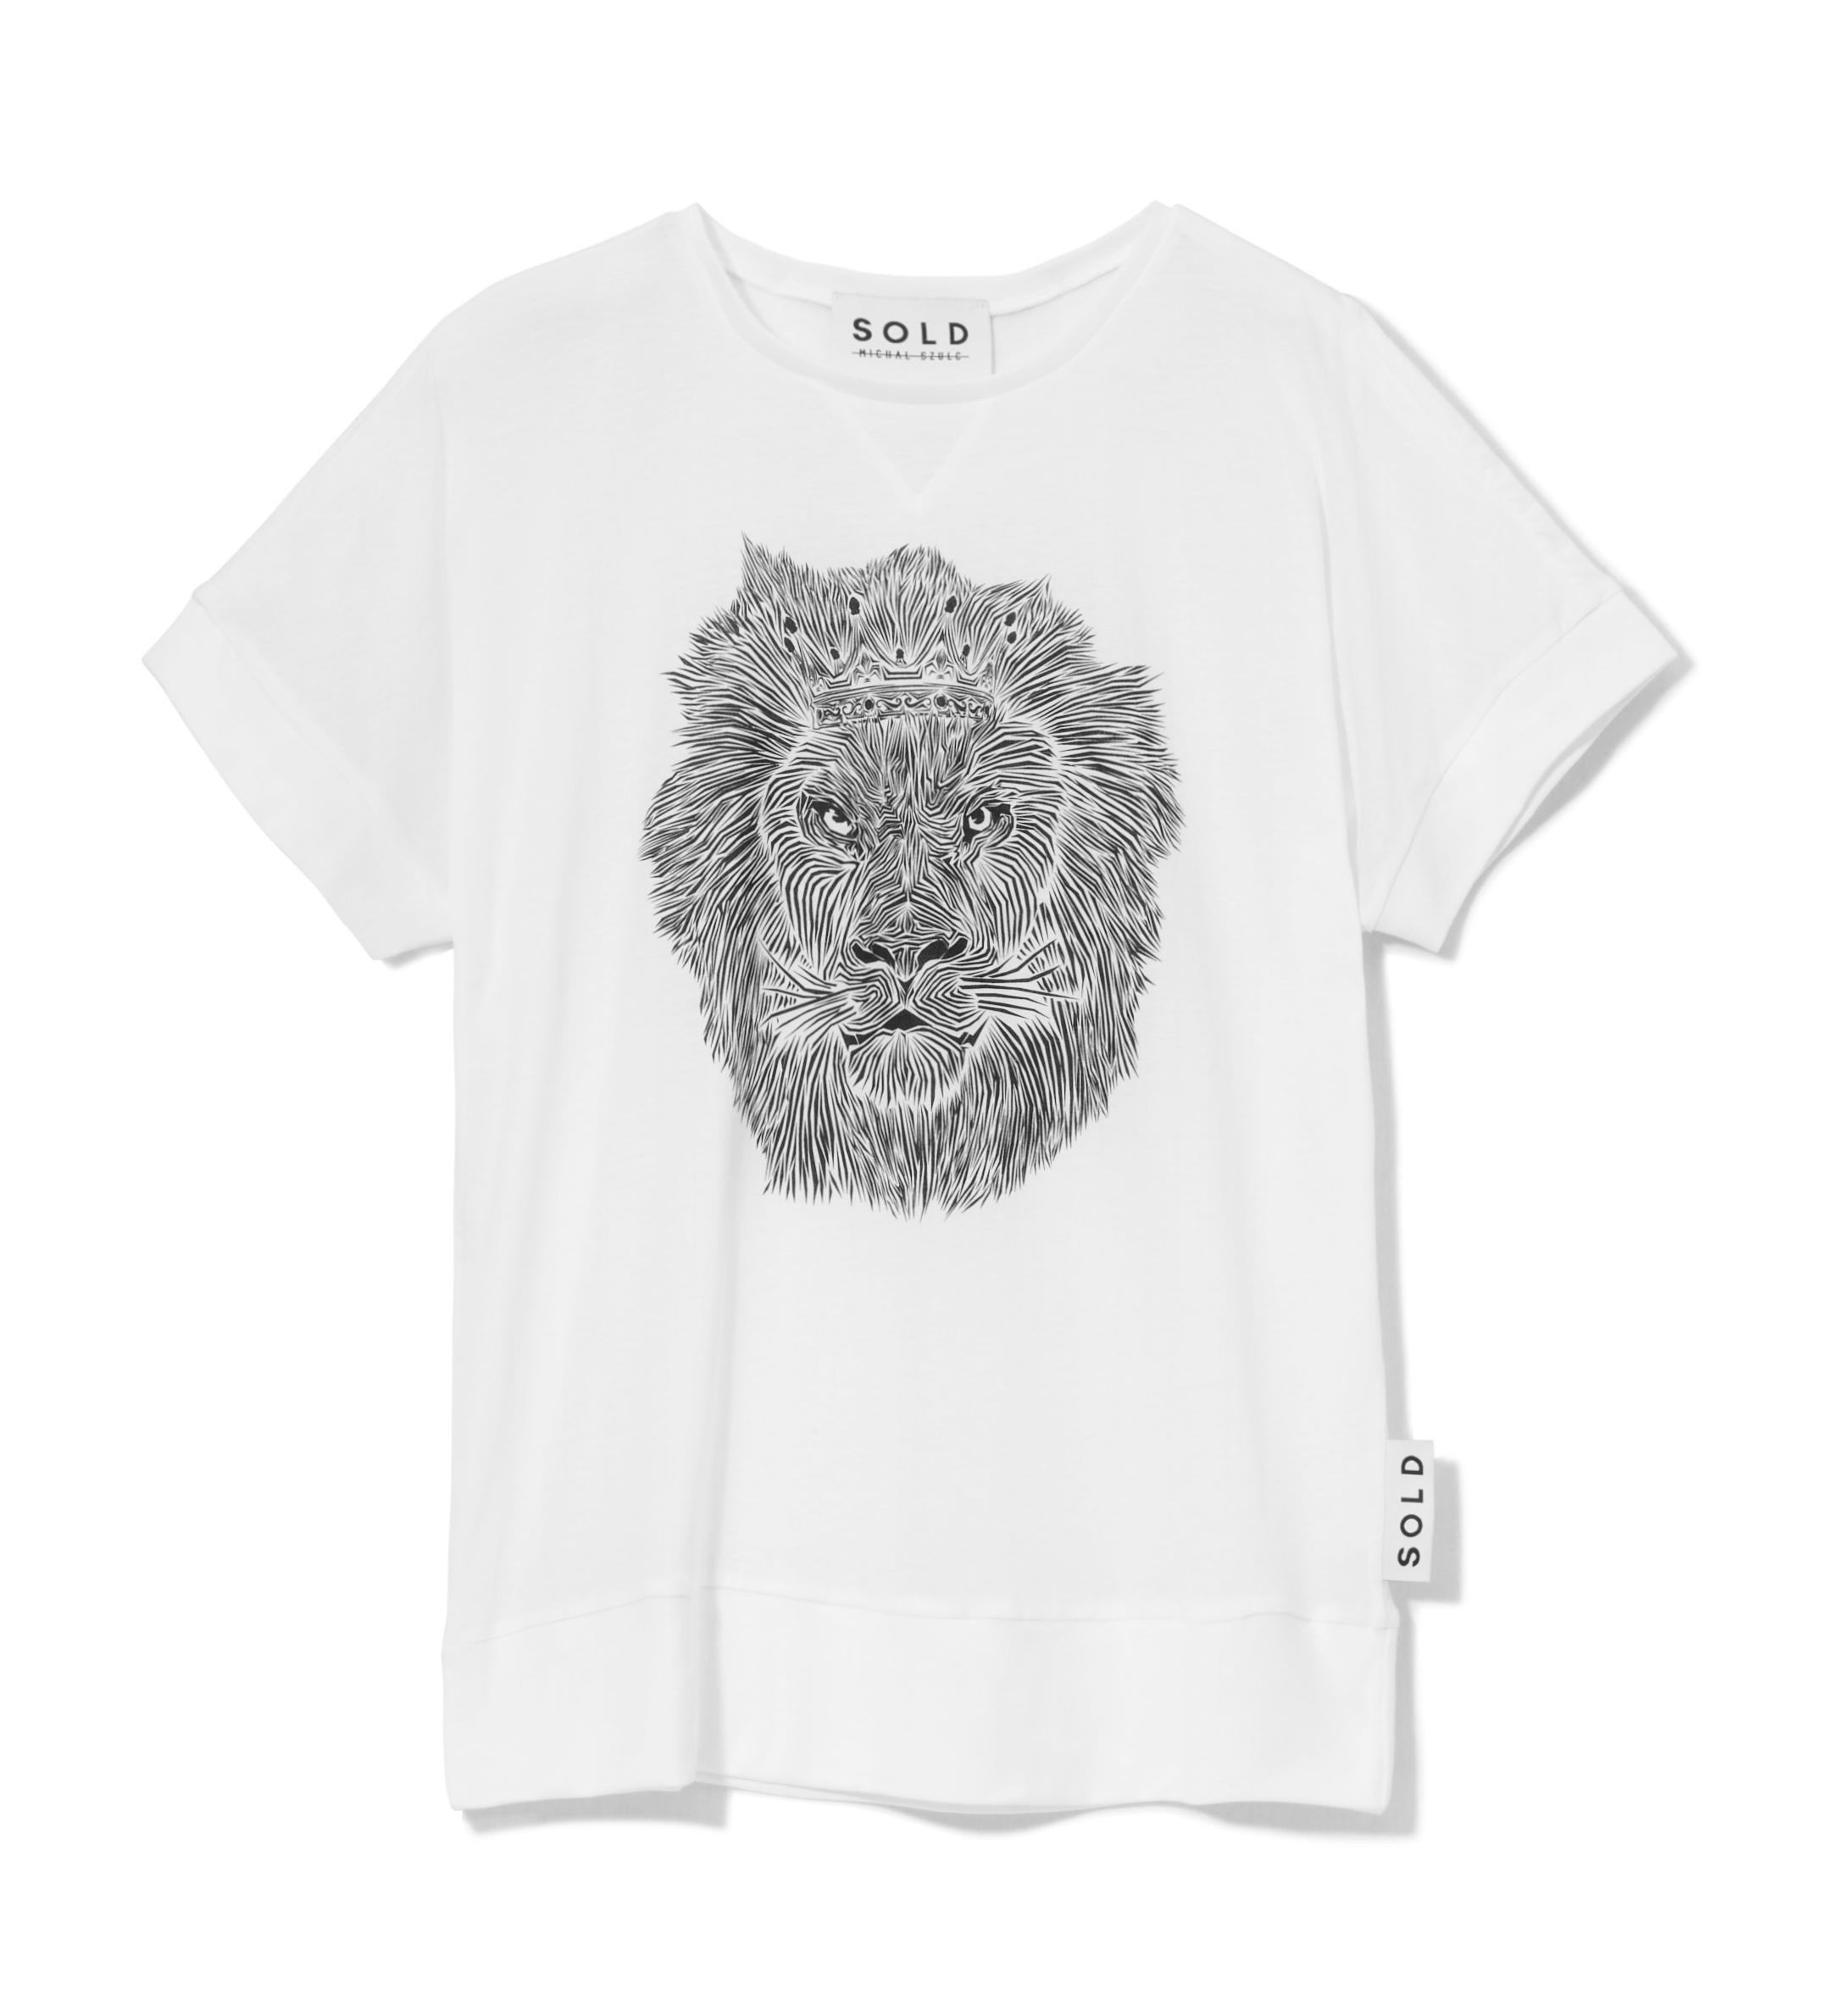 SOLD Micha_ Szulc TSHIRT LION WHITE 149 z_